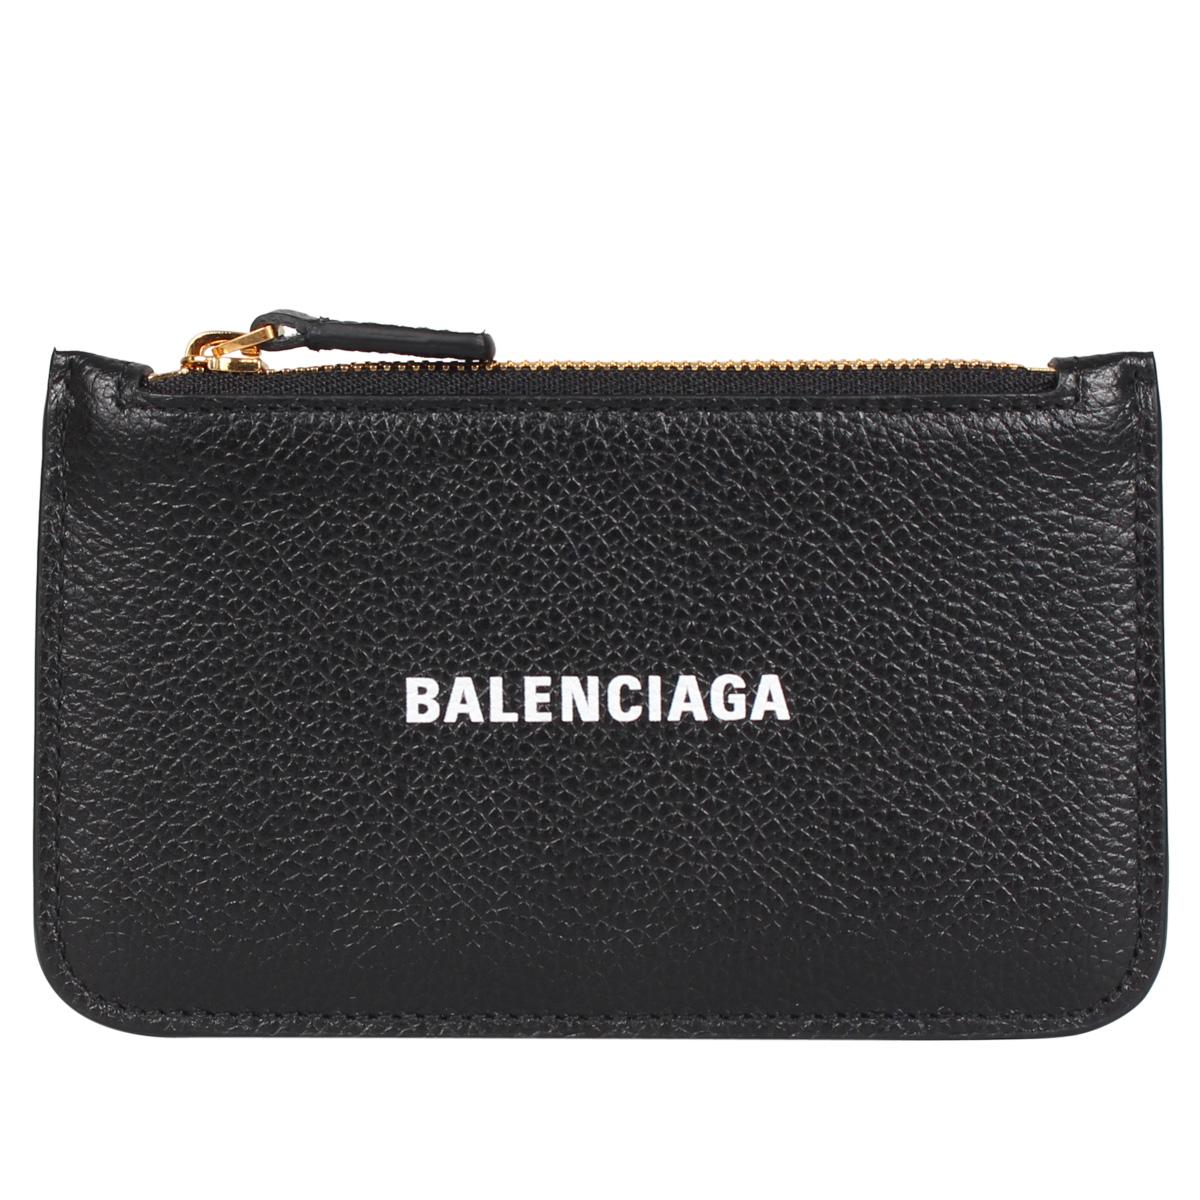 BALENCIAGA COIN AND CARD HOLDER バレンシアガ 財布 小銭入れ コインケース カードケース メンズ レディース  ブラック 黒 594214 [4/14 新入荷]